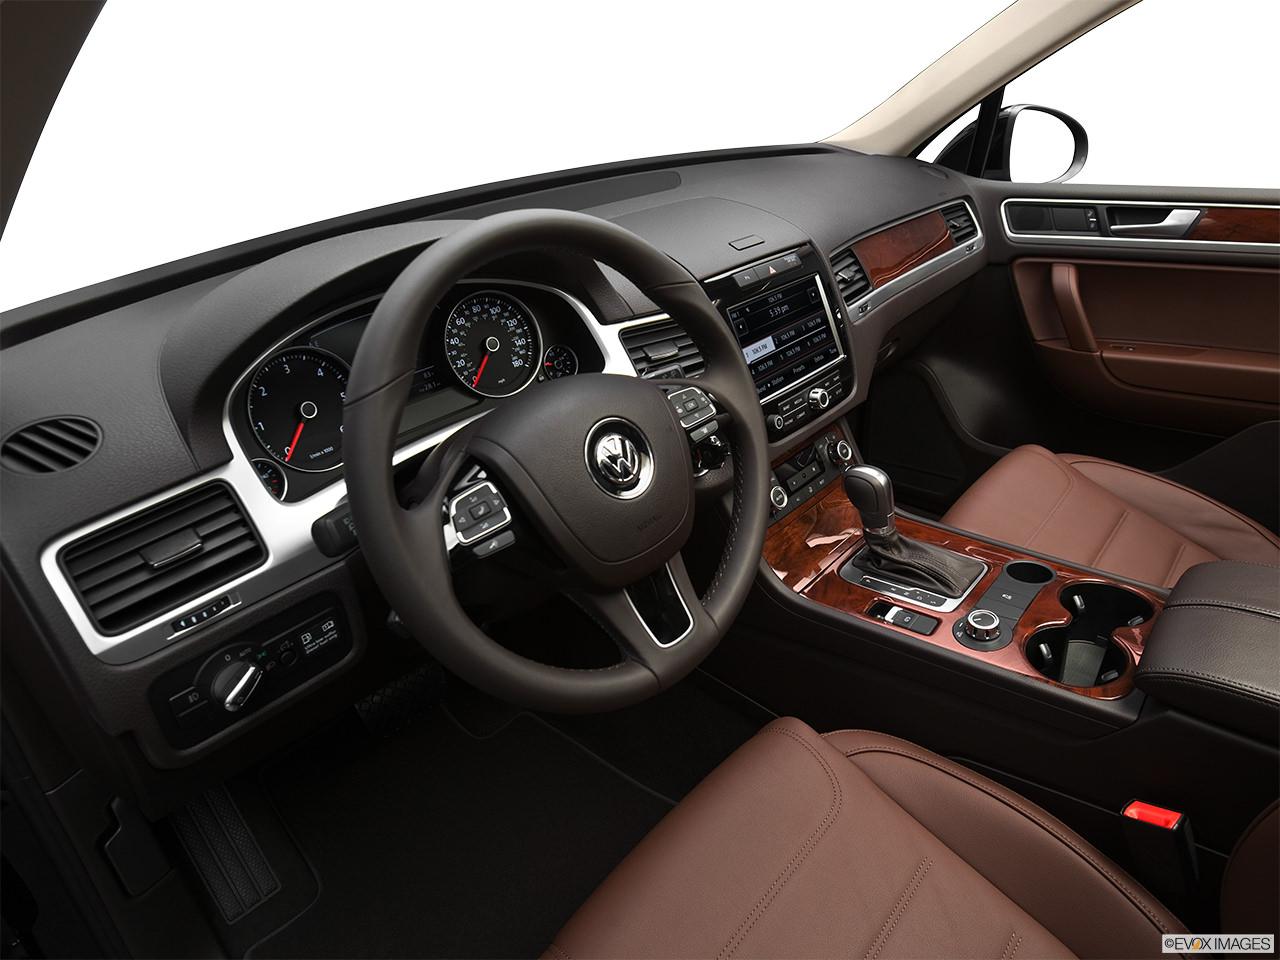 Volkswagen Touareg TDI 2012 Interior